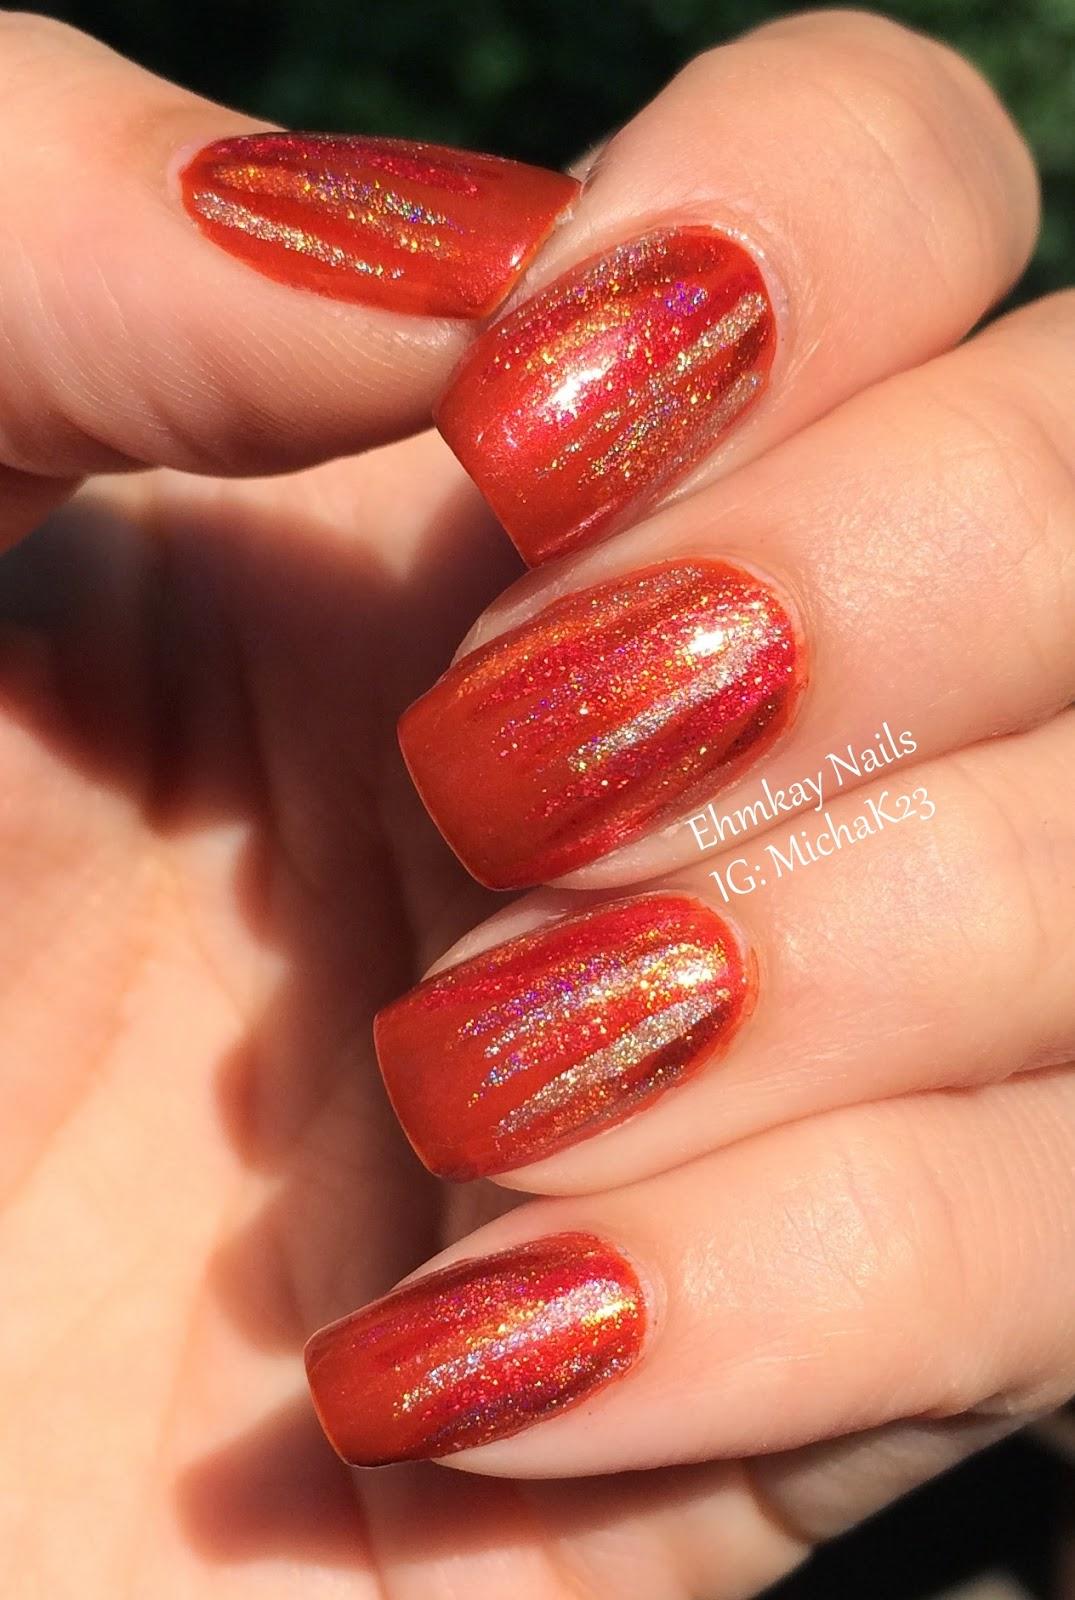 Ehmkay Nails: Orange Waterfall Nail Art